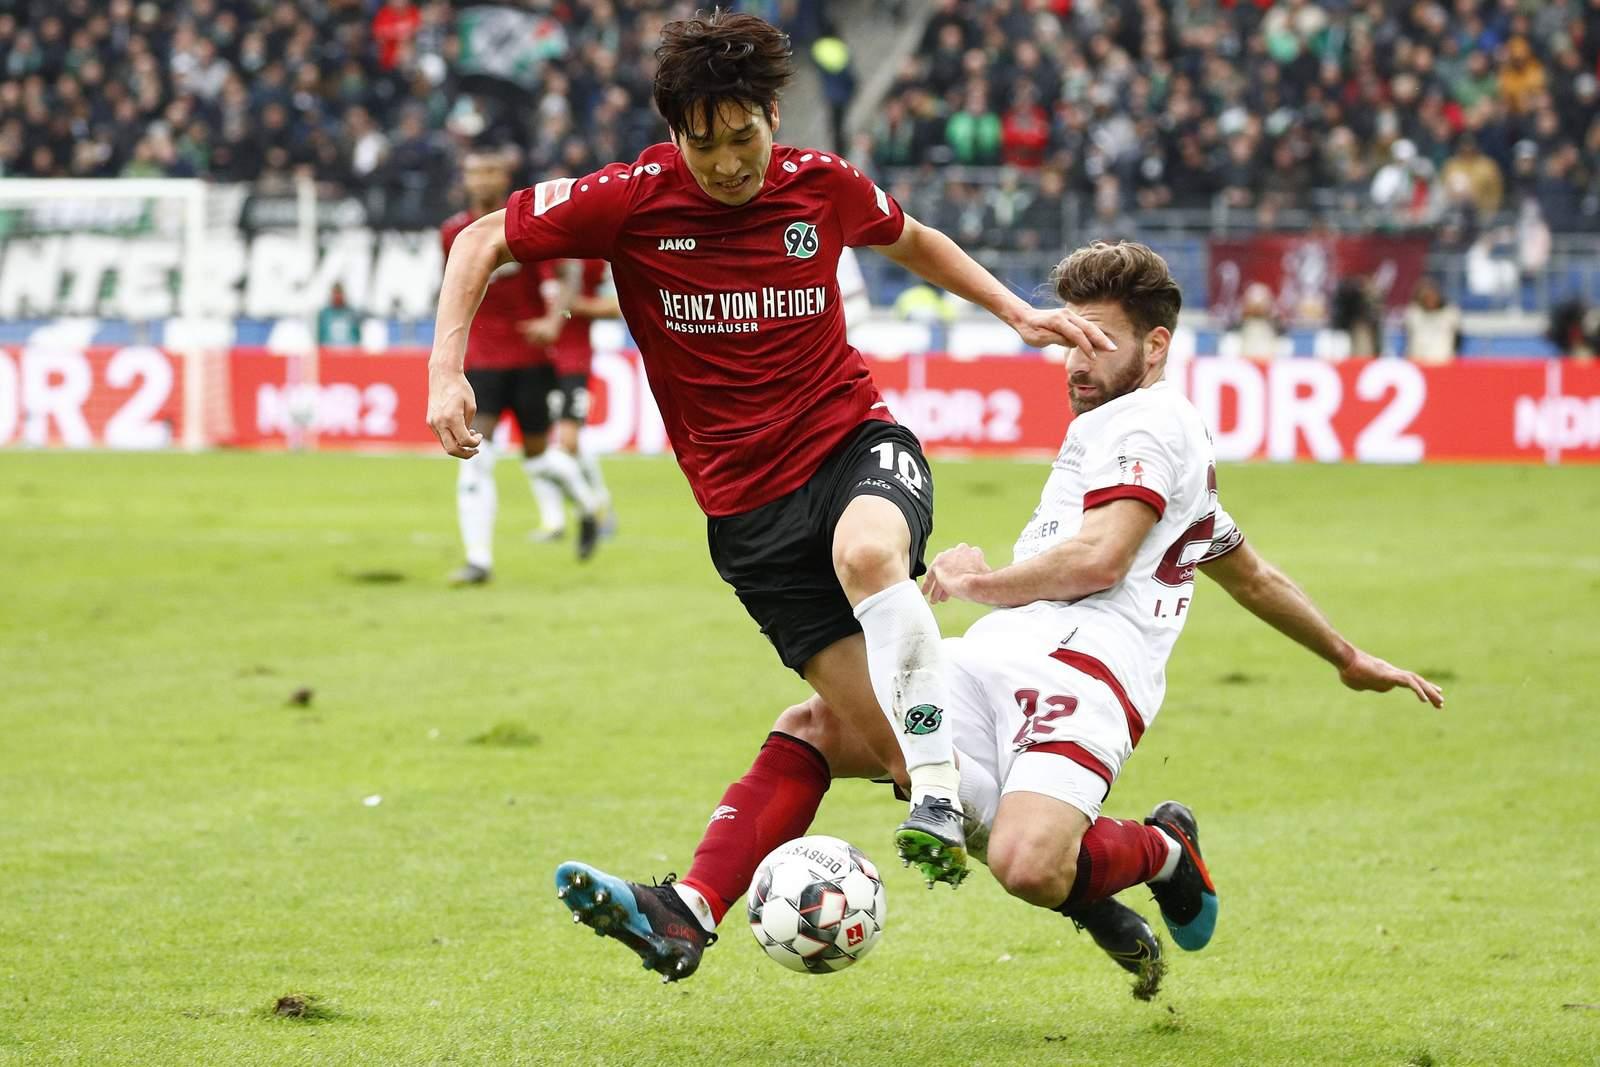 Genki Haraguchi gegen Enrico Valentini